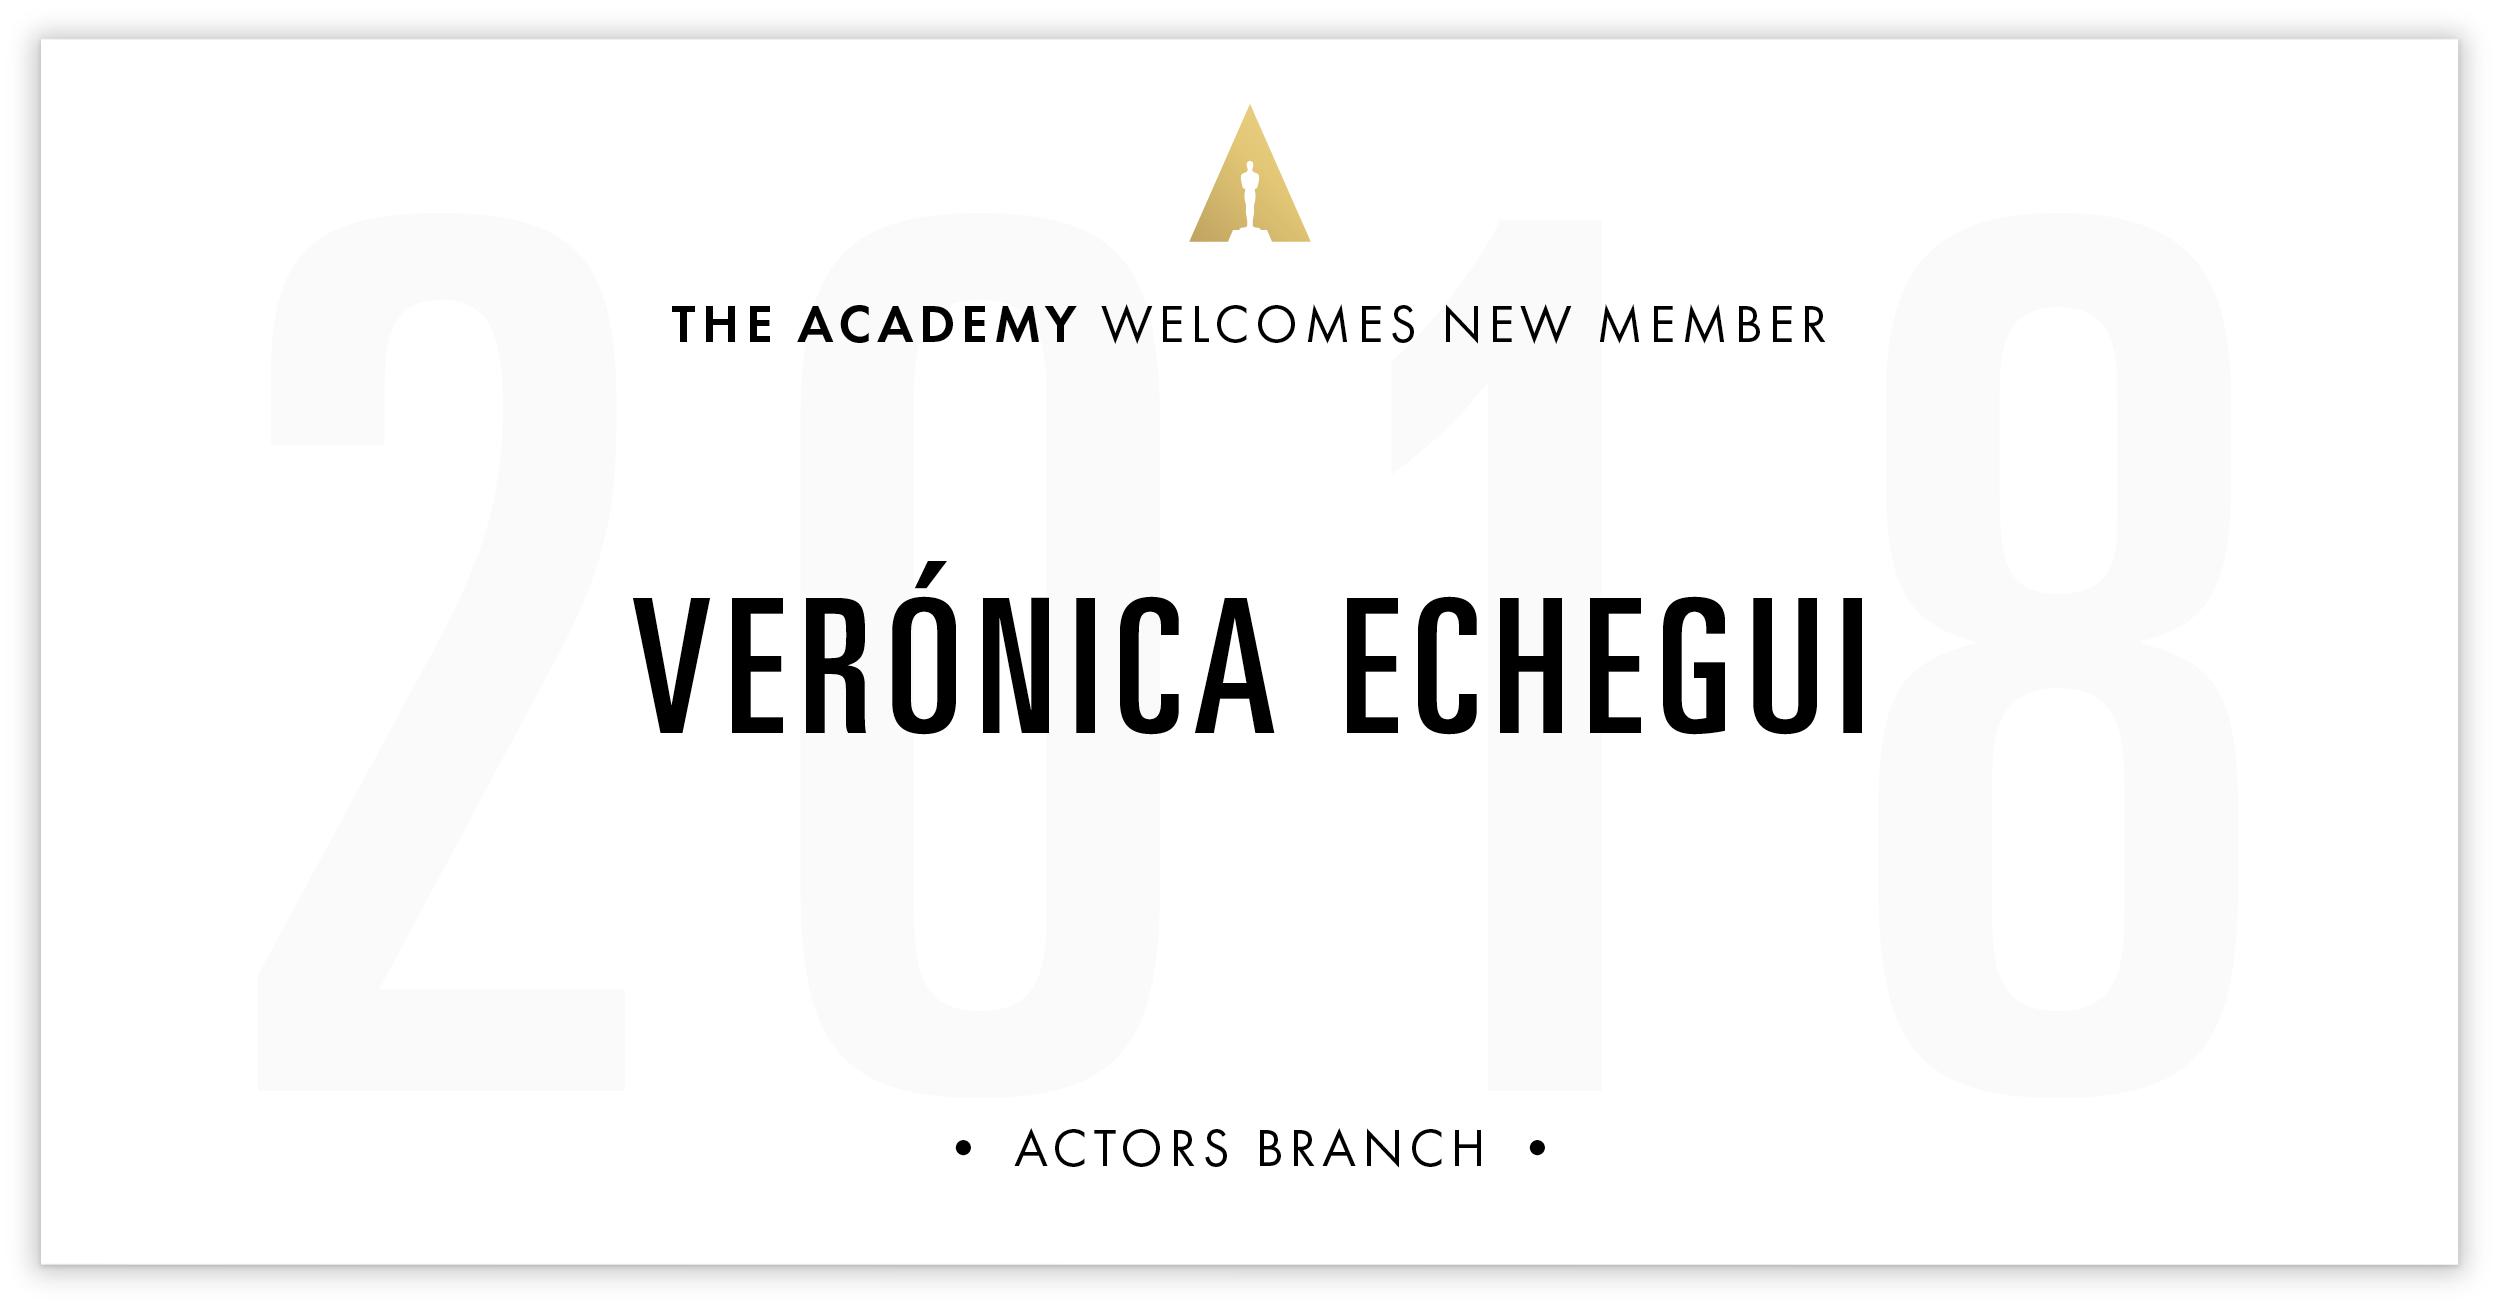 Verónica Echegui is invited!